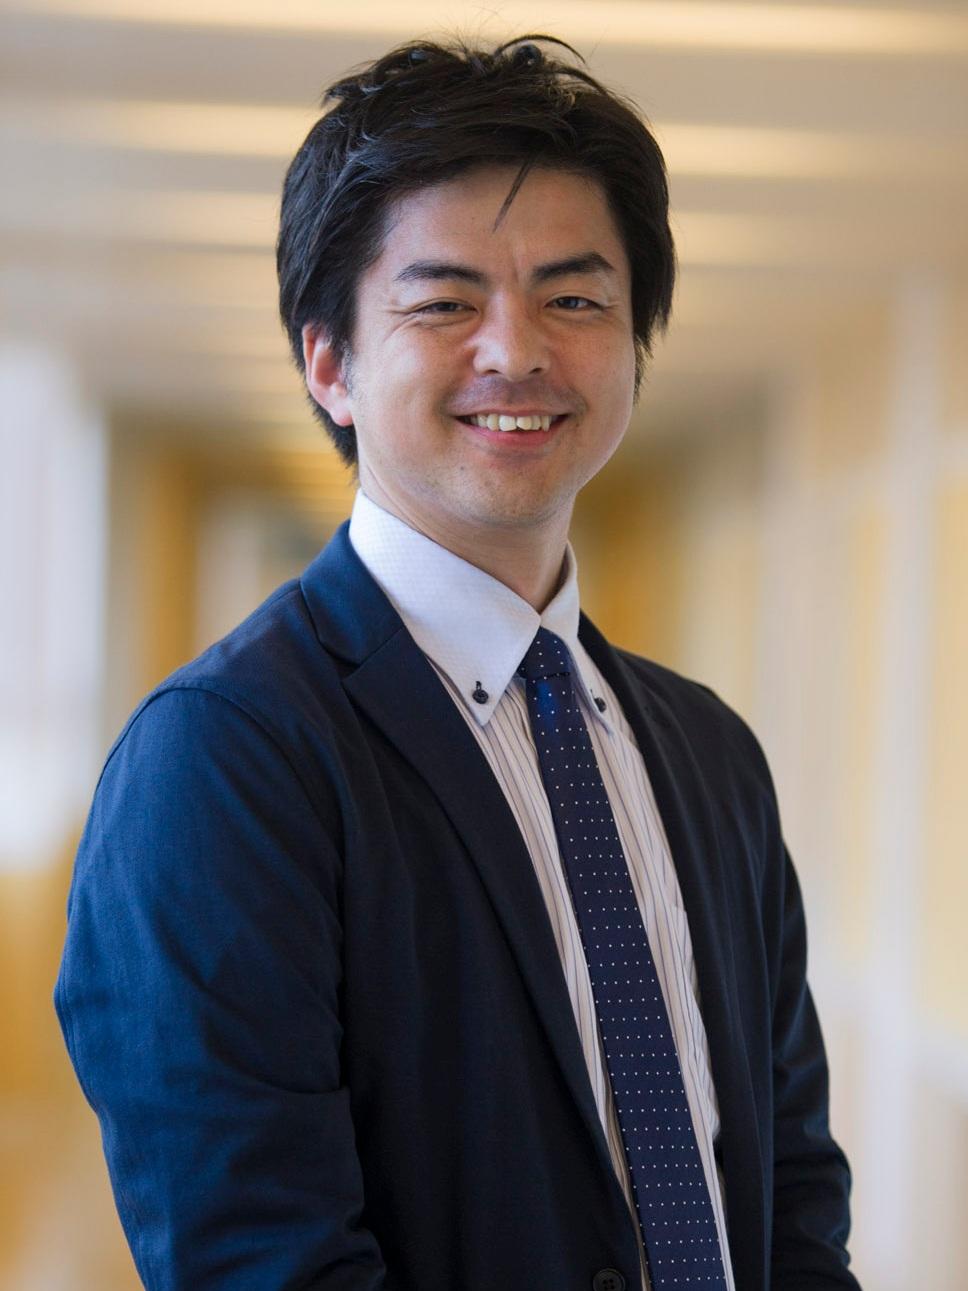 Shunsuke Nonaka - 東京未来大学こども心理学部Lecturer (Tokyo Future University)